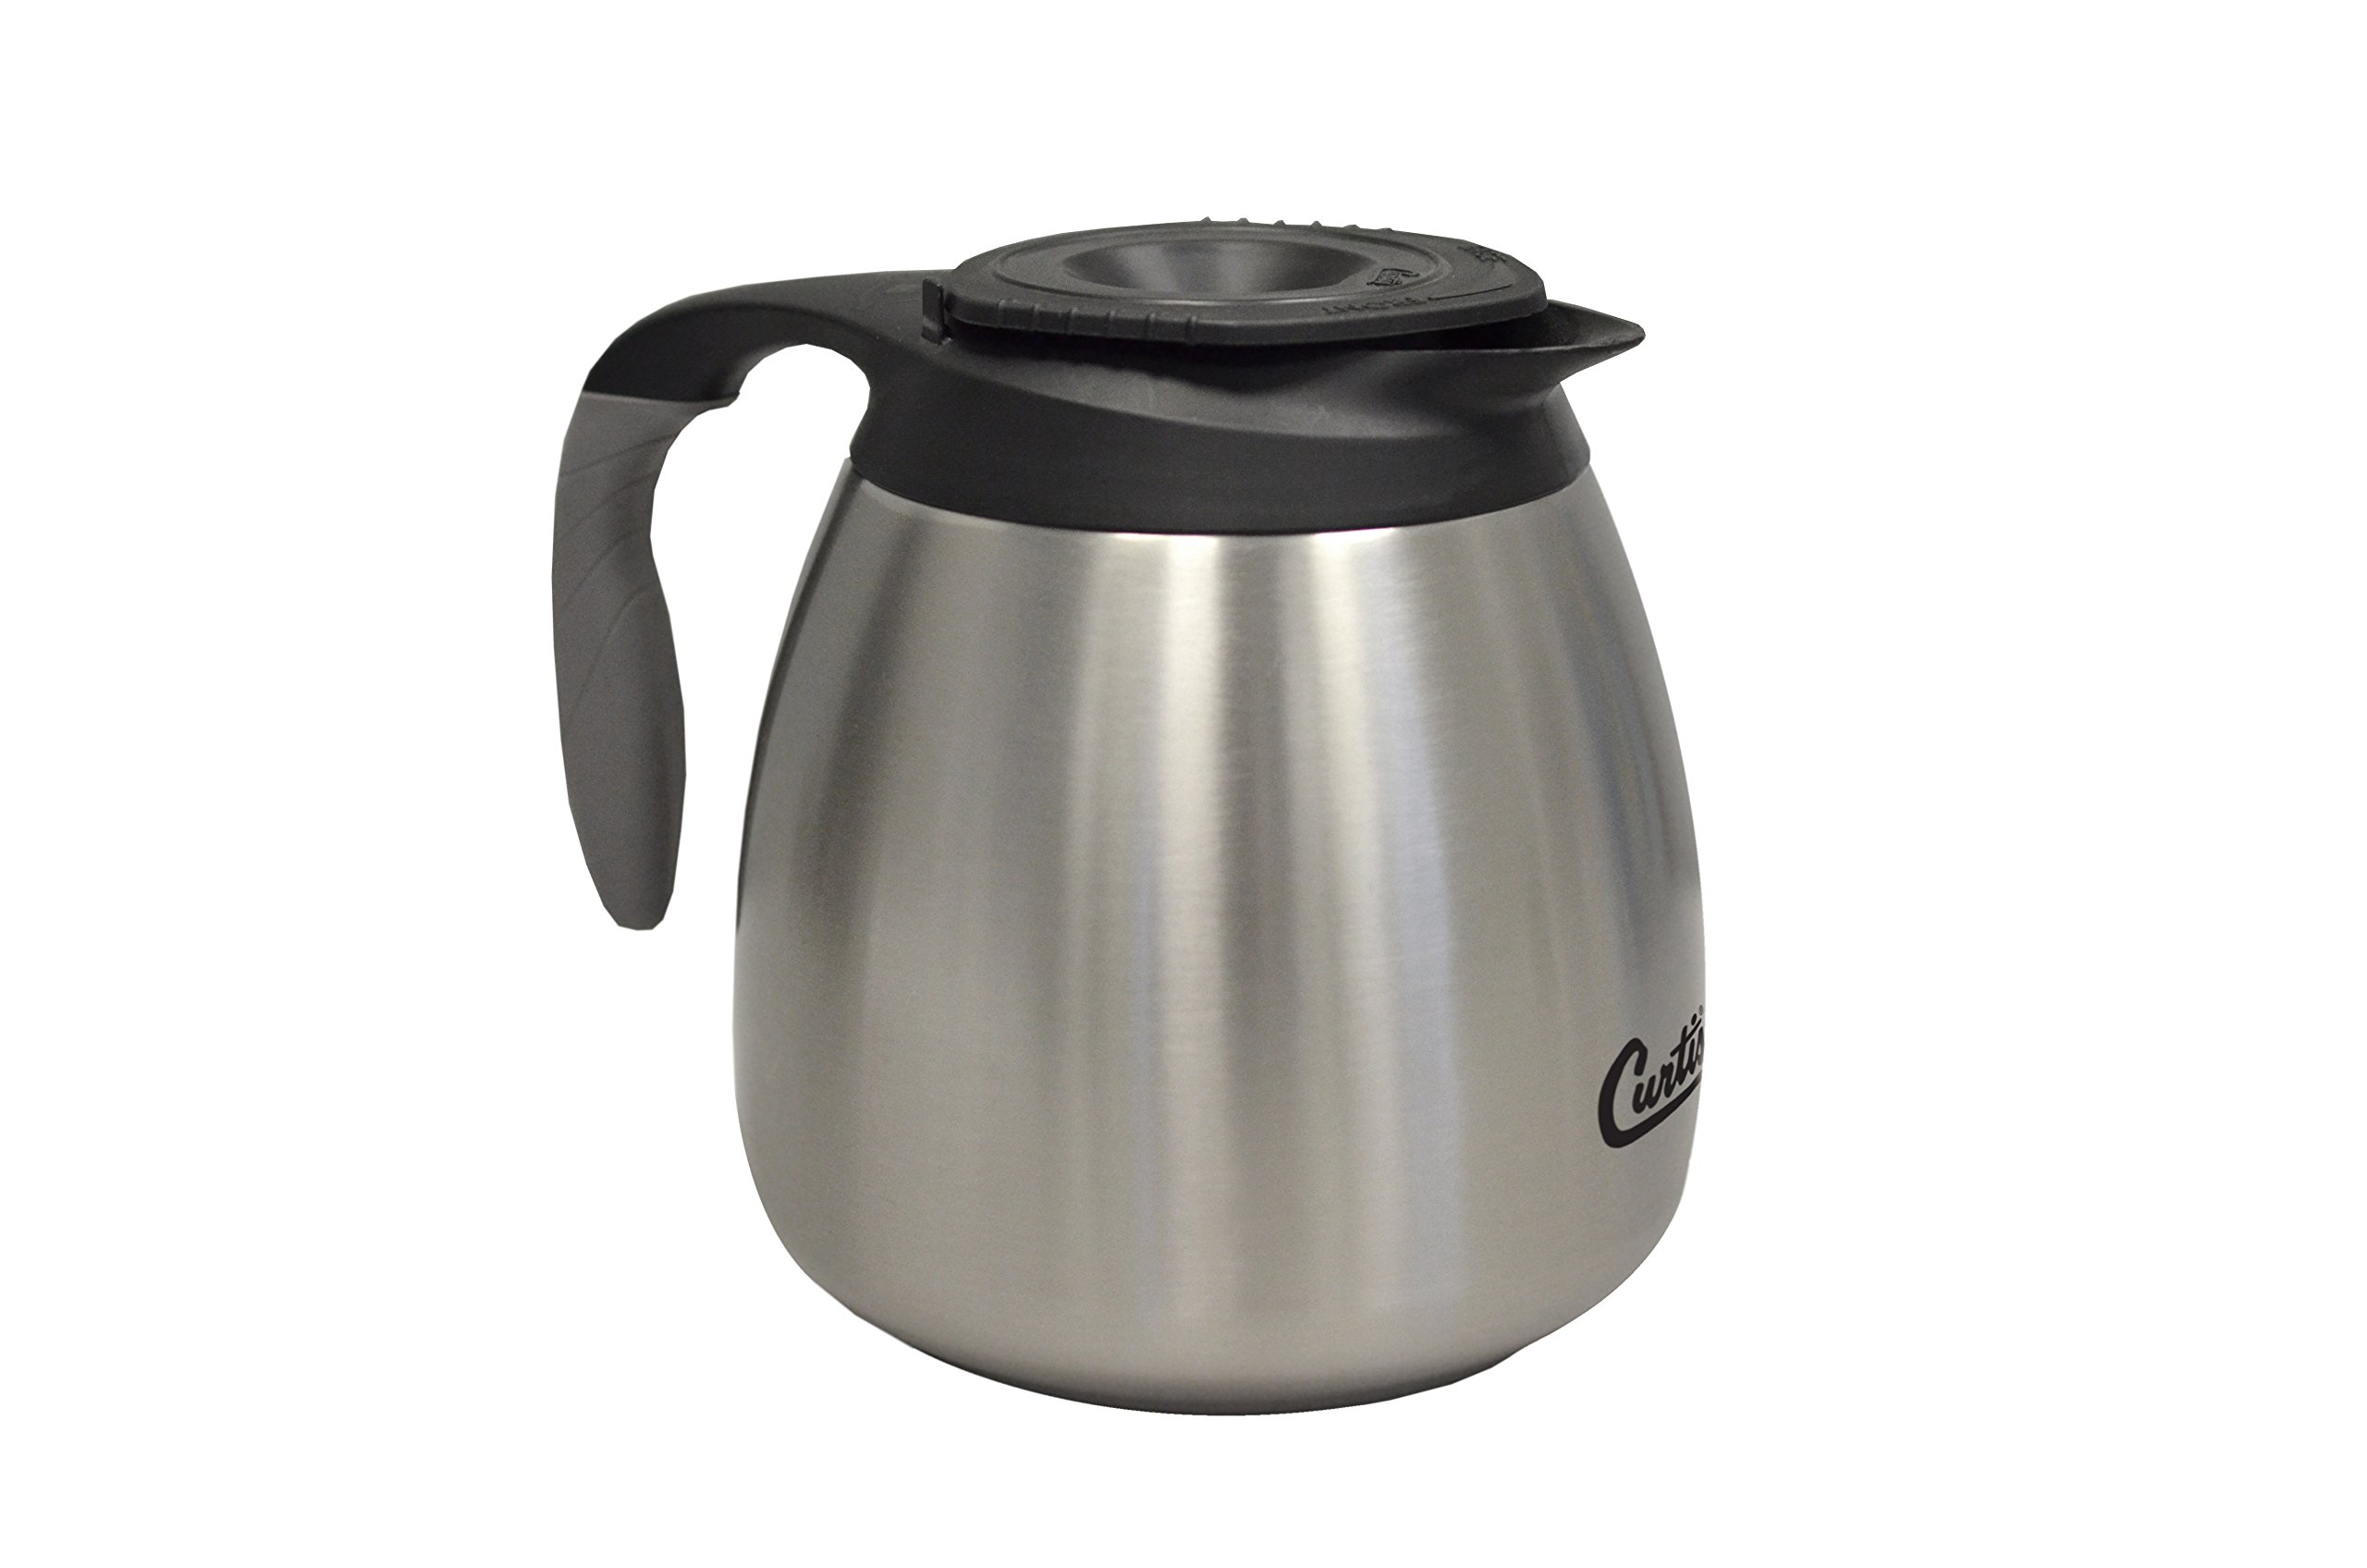 Wilbur Curtis Thermal Dispenser Seamless Pourpot, 64 Oz, Ss Exterior/Liner, Brew-Thru Lid - Commercial Airpot Pourpot Beverage Dispenser - CLXP6401S100 (Each)